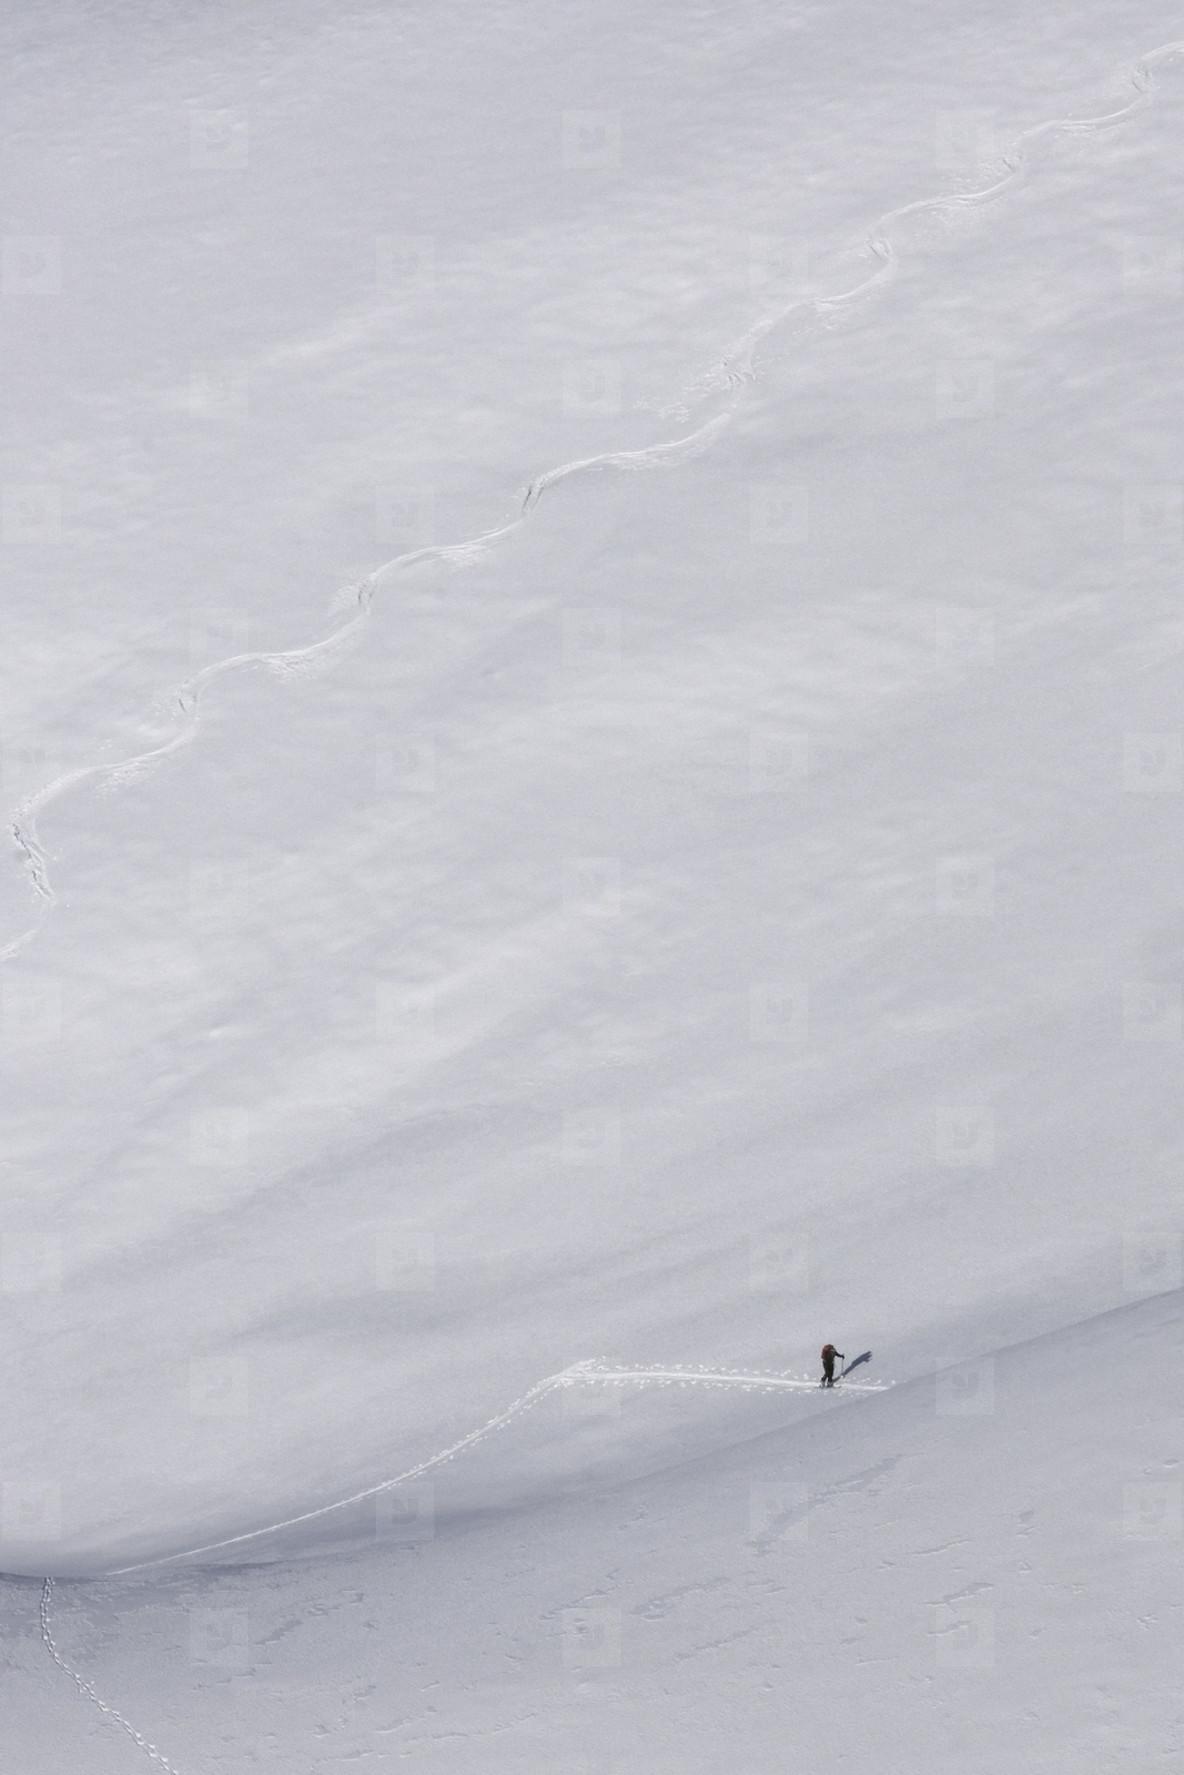 Distant hiker on steep mountain ski slope